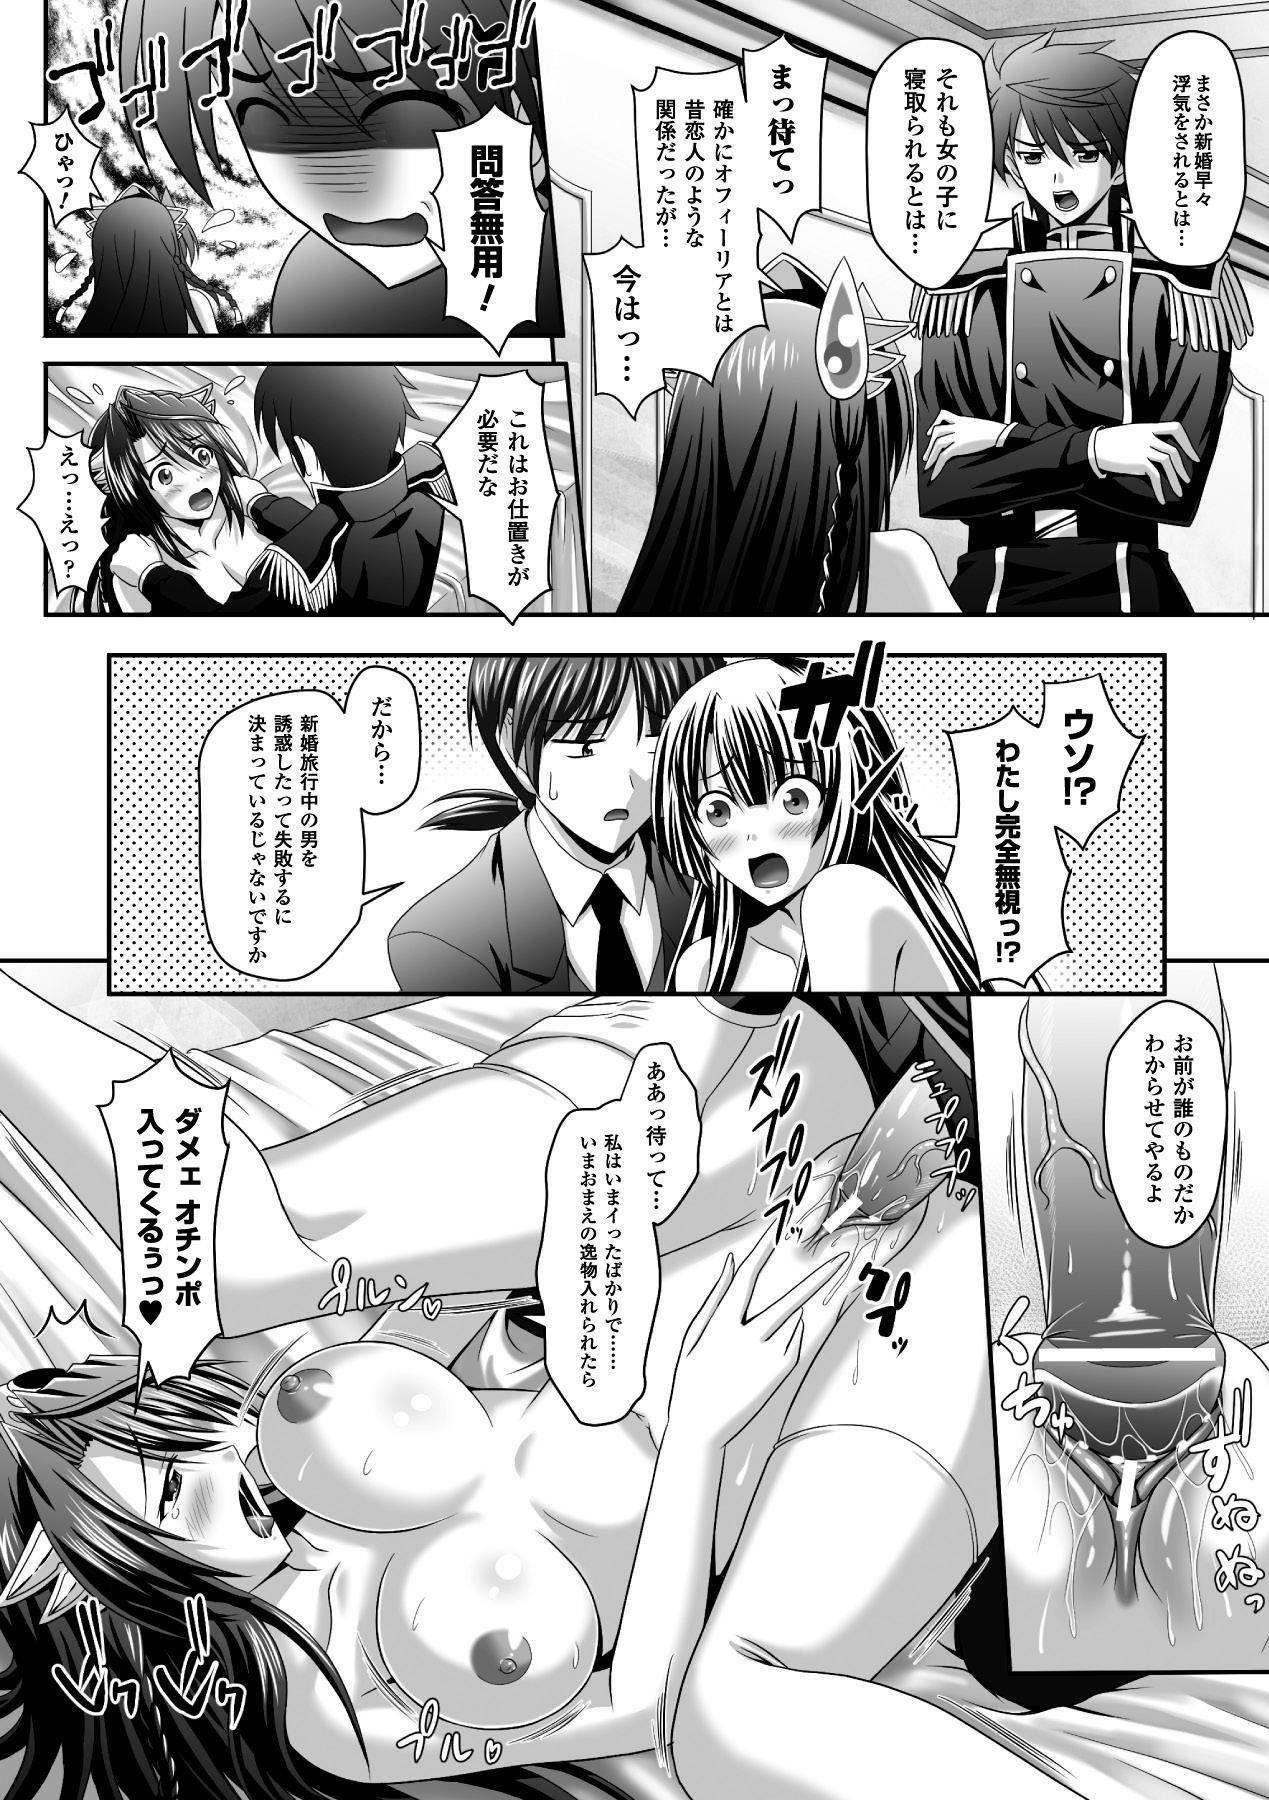 Megami Crisis 10 86